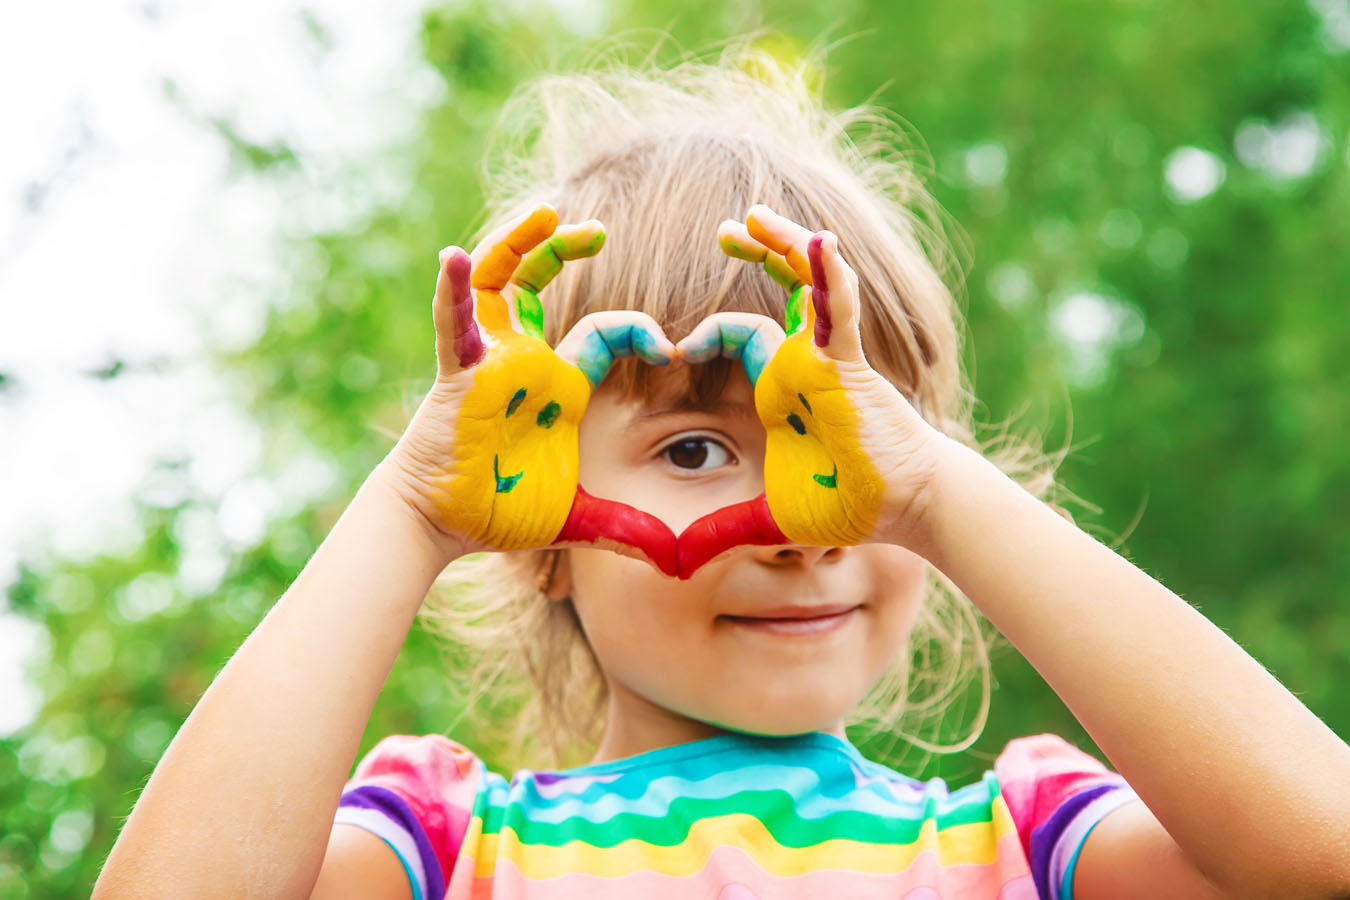 Una bambina forma un cuore con le sue mani dipinte